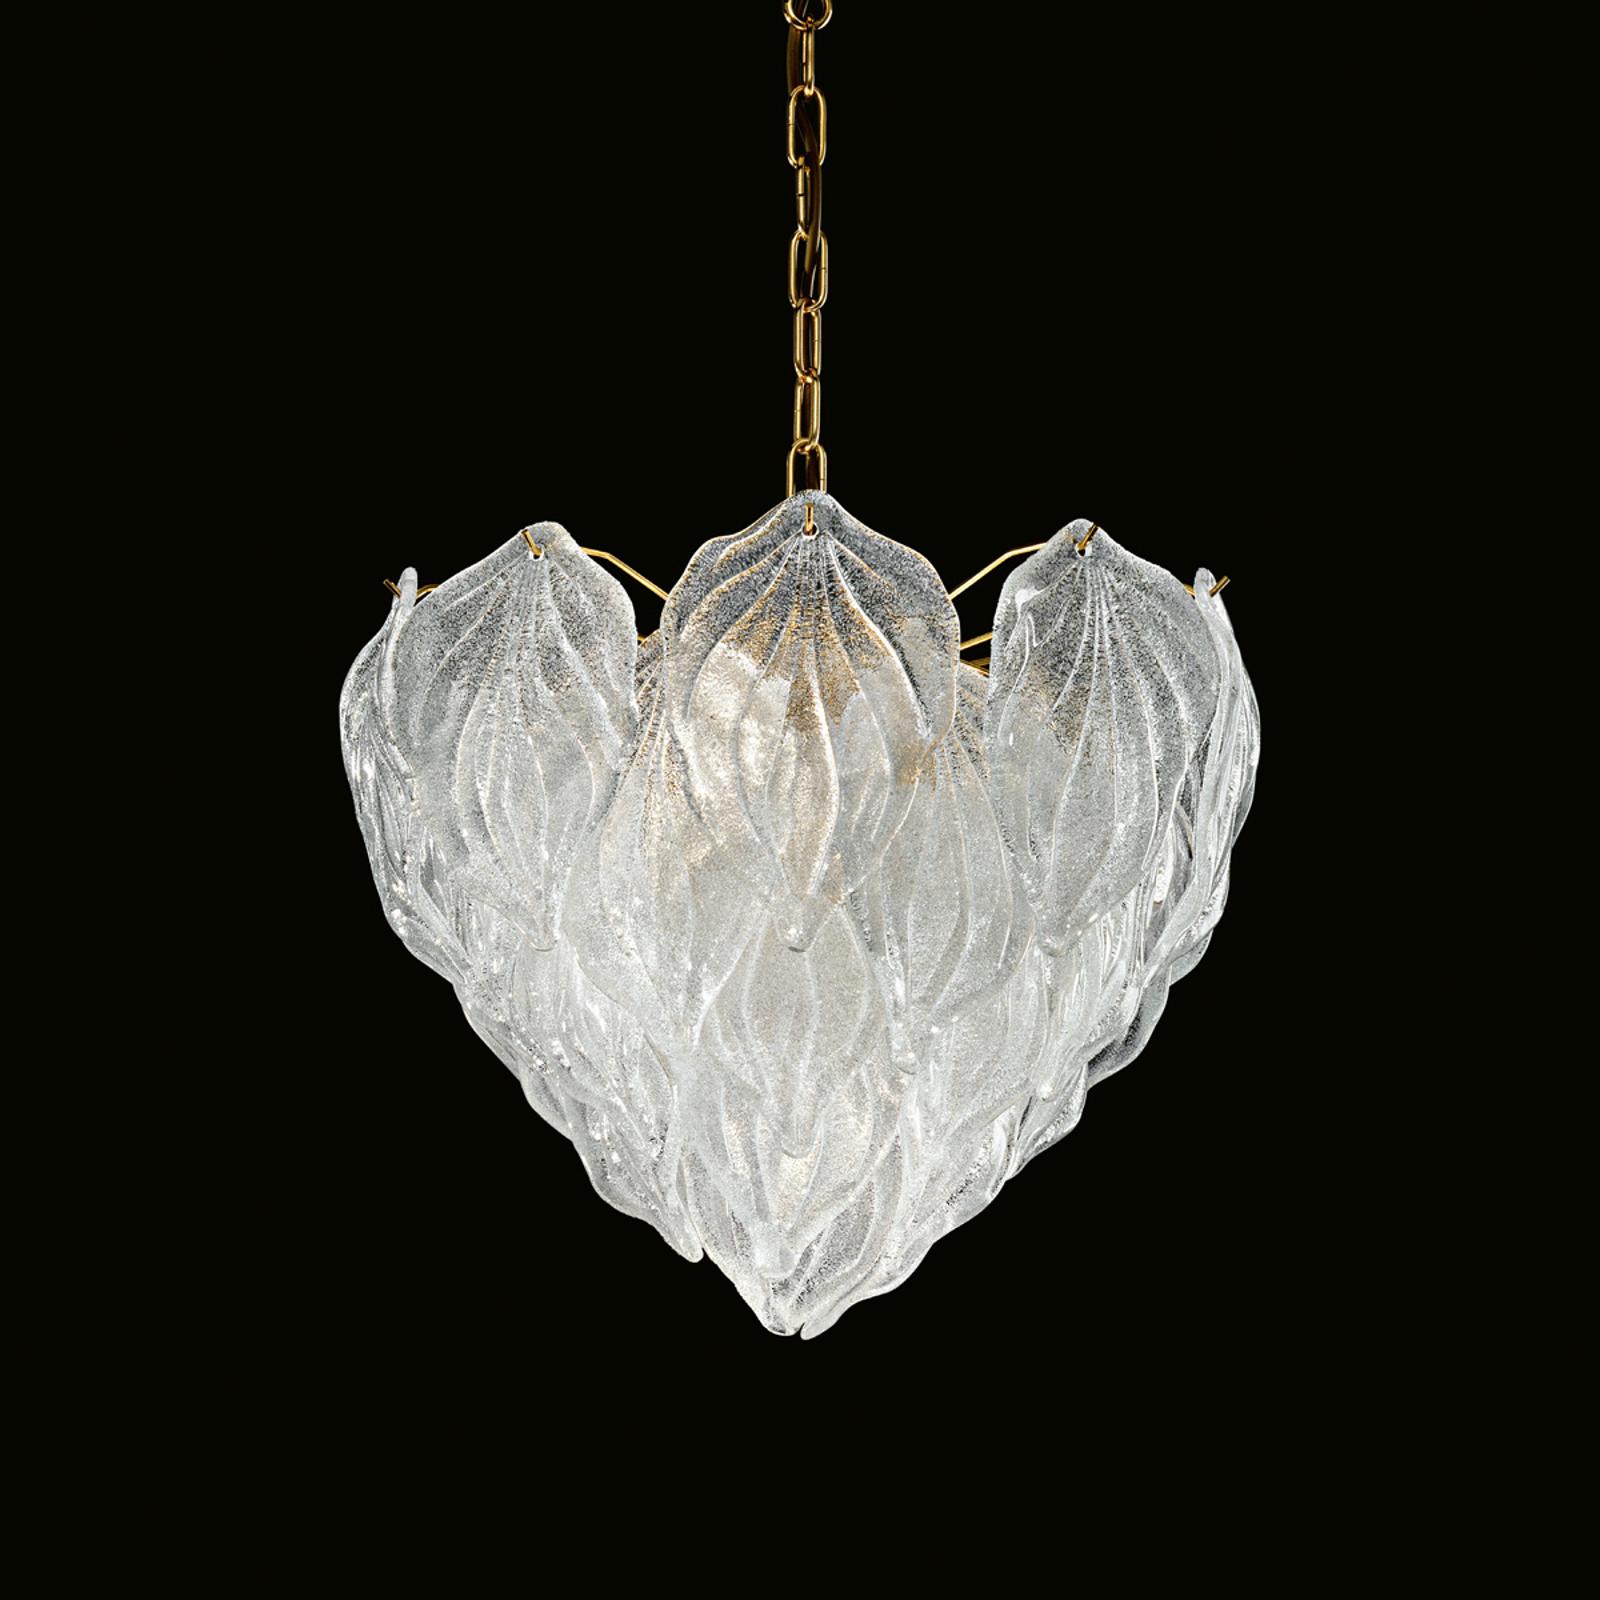 Meerlagige glazen hanglamp Foglie, 45 cm